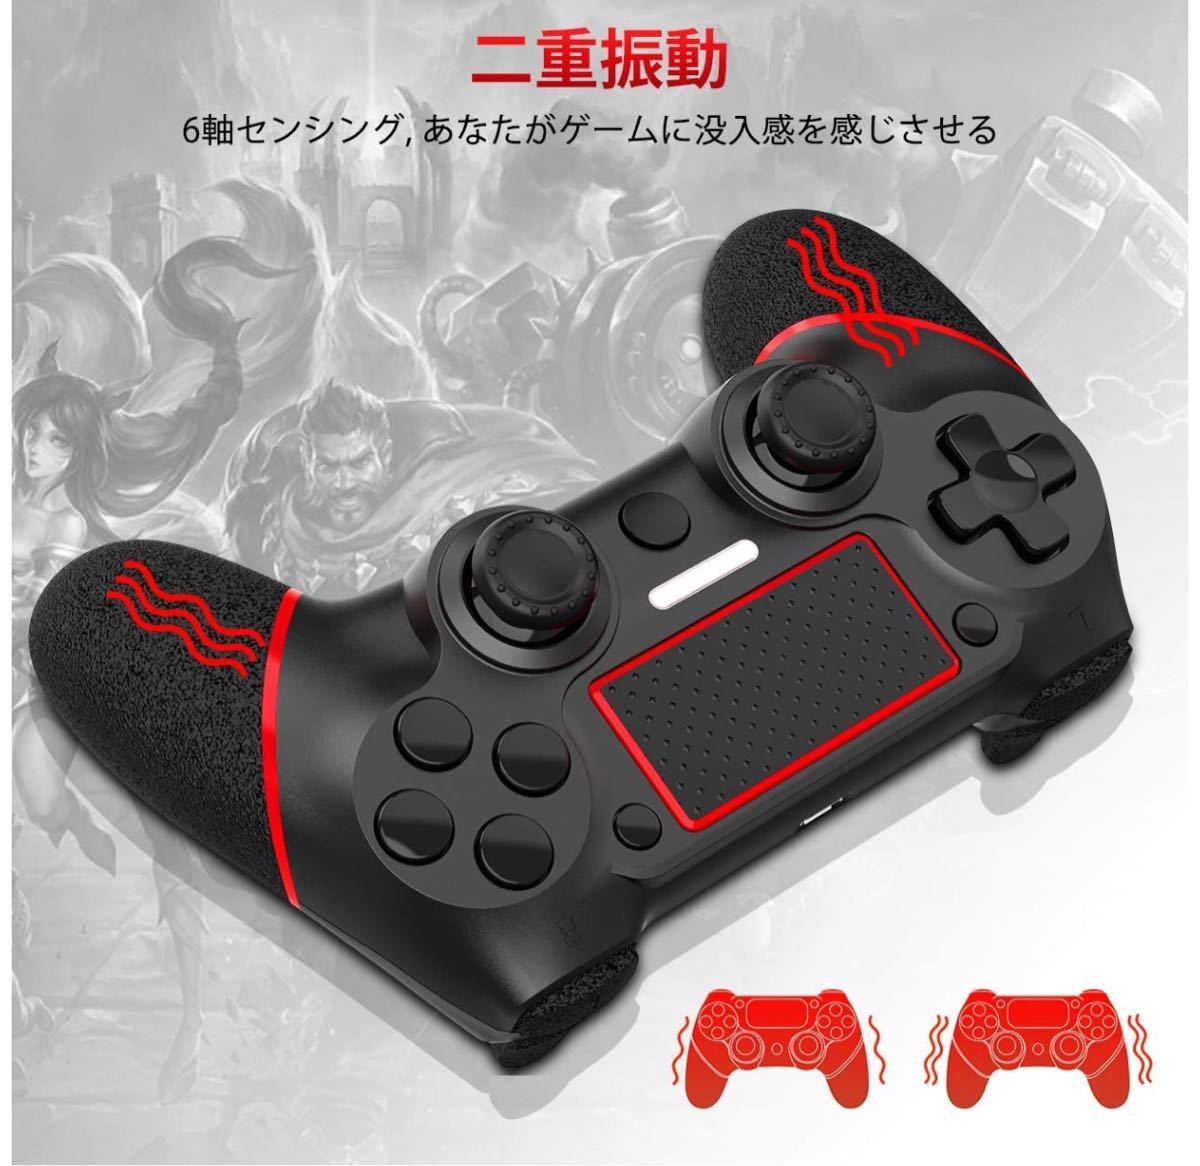 PS4 コントローラー ワイヤレス ゲームパッド 人体工学 二重振動